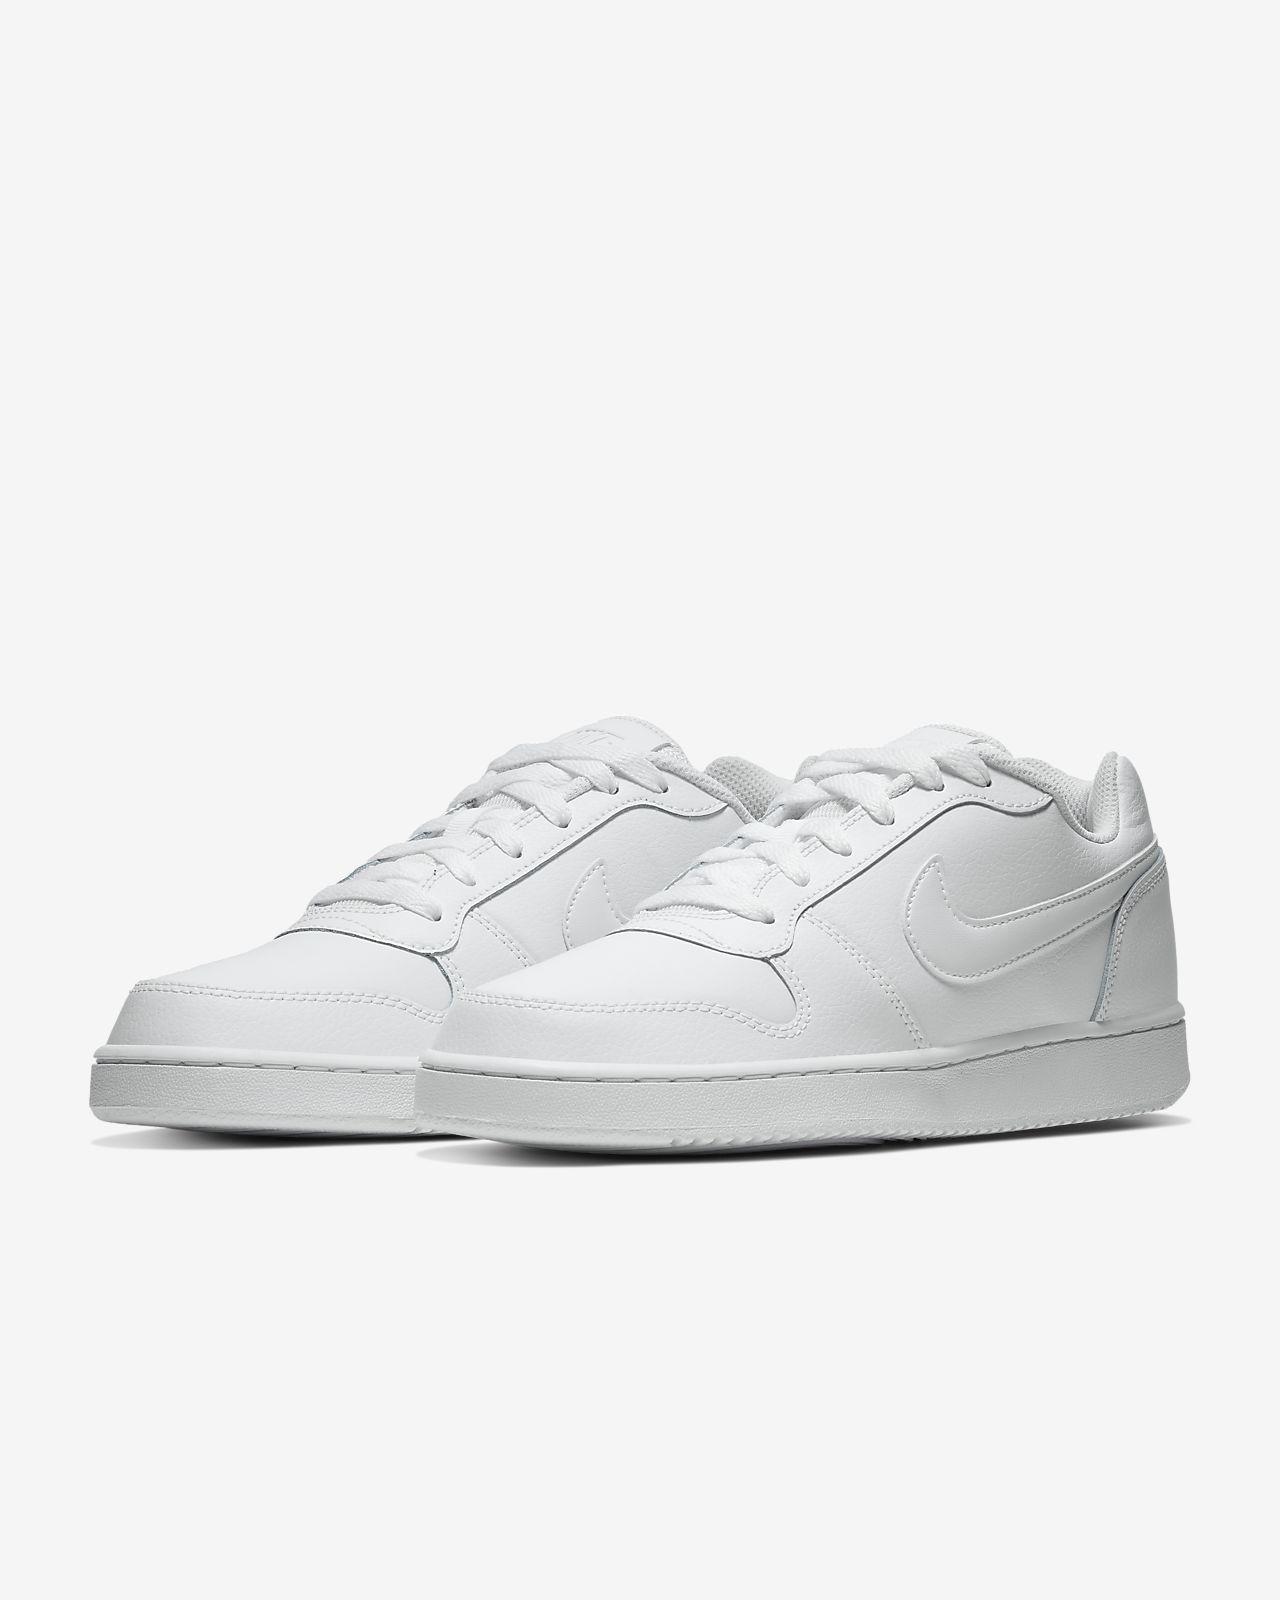 Buty damskie Nike Ebernon Low. Nike PL